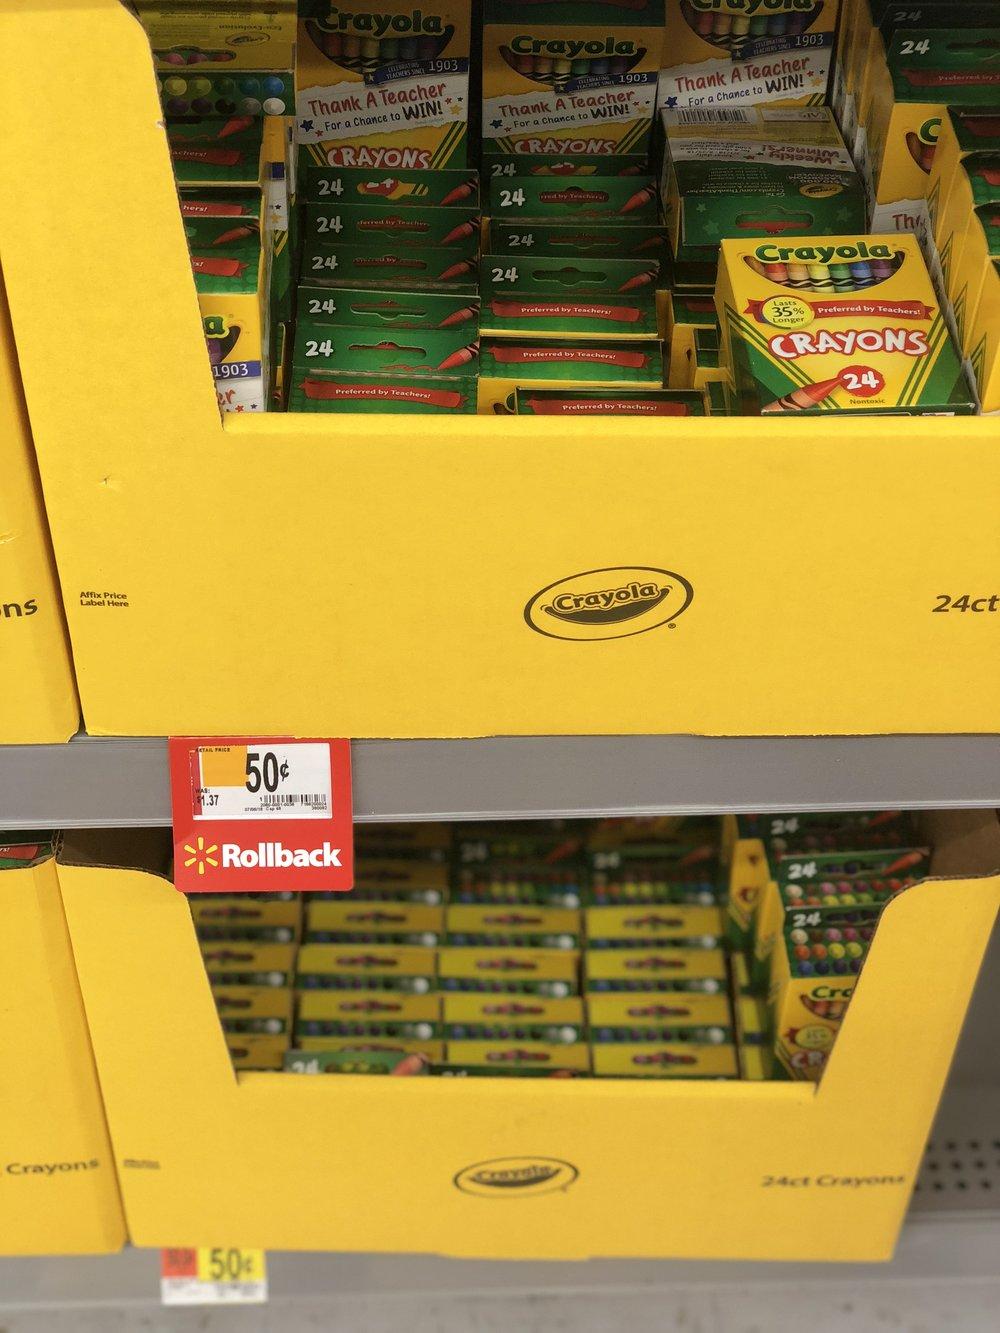 Walmart - Crayola 24 CT Crayons $0.50 each